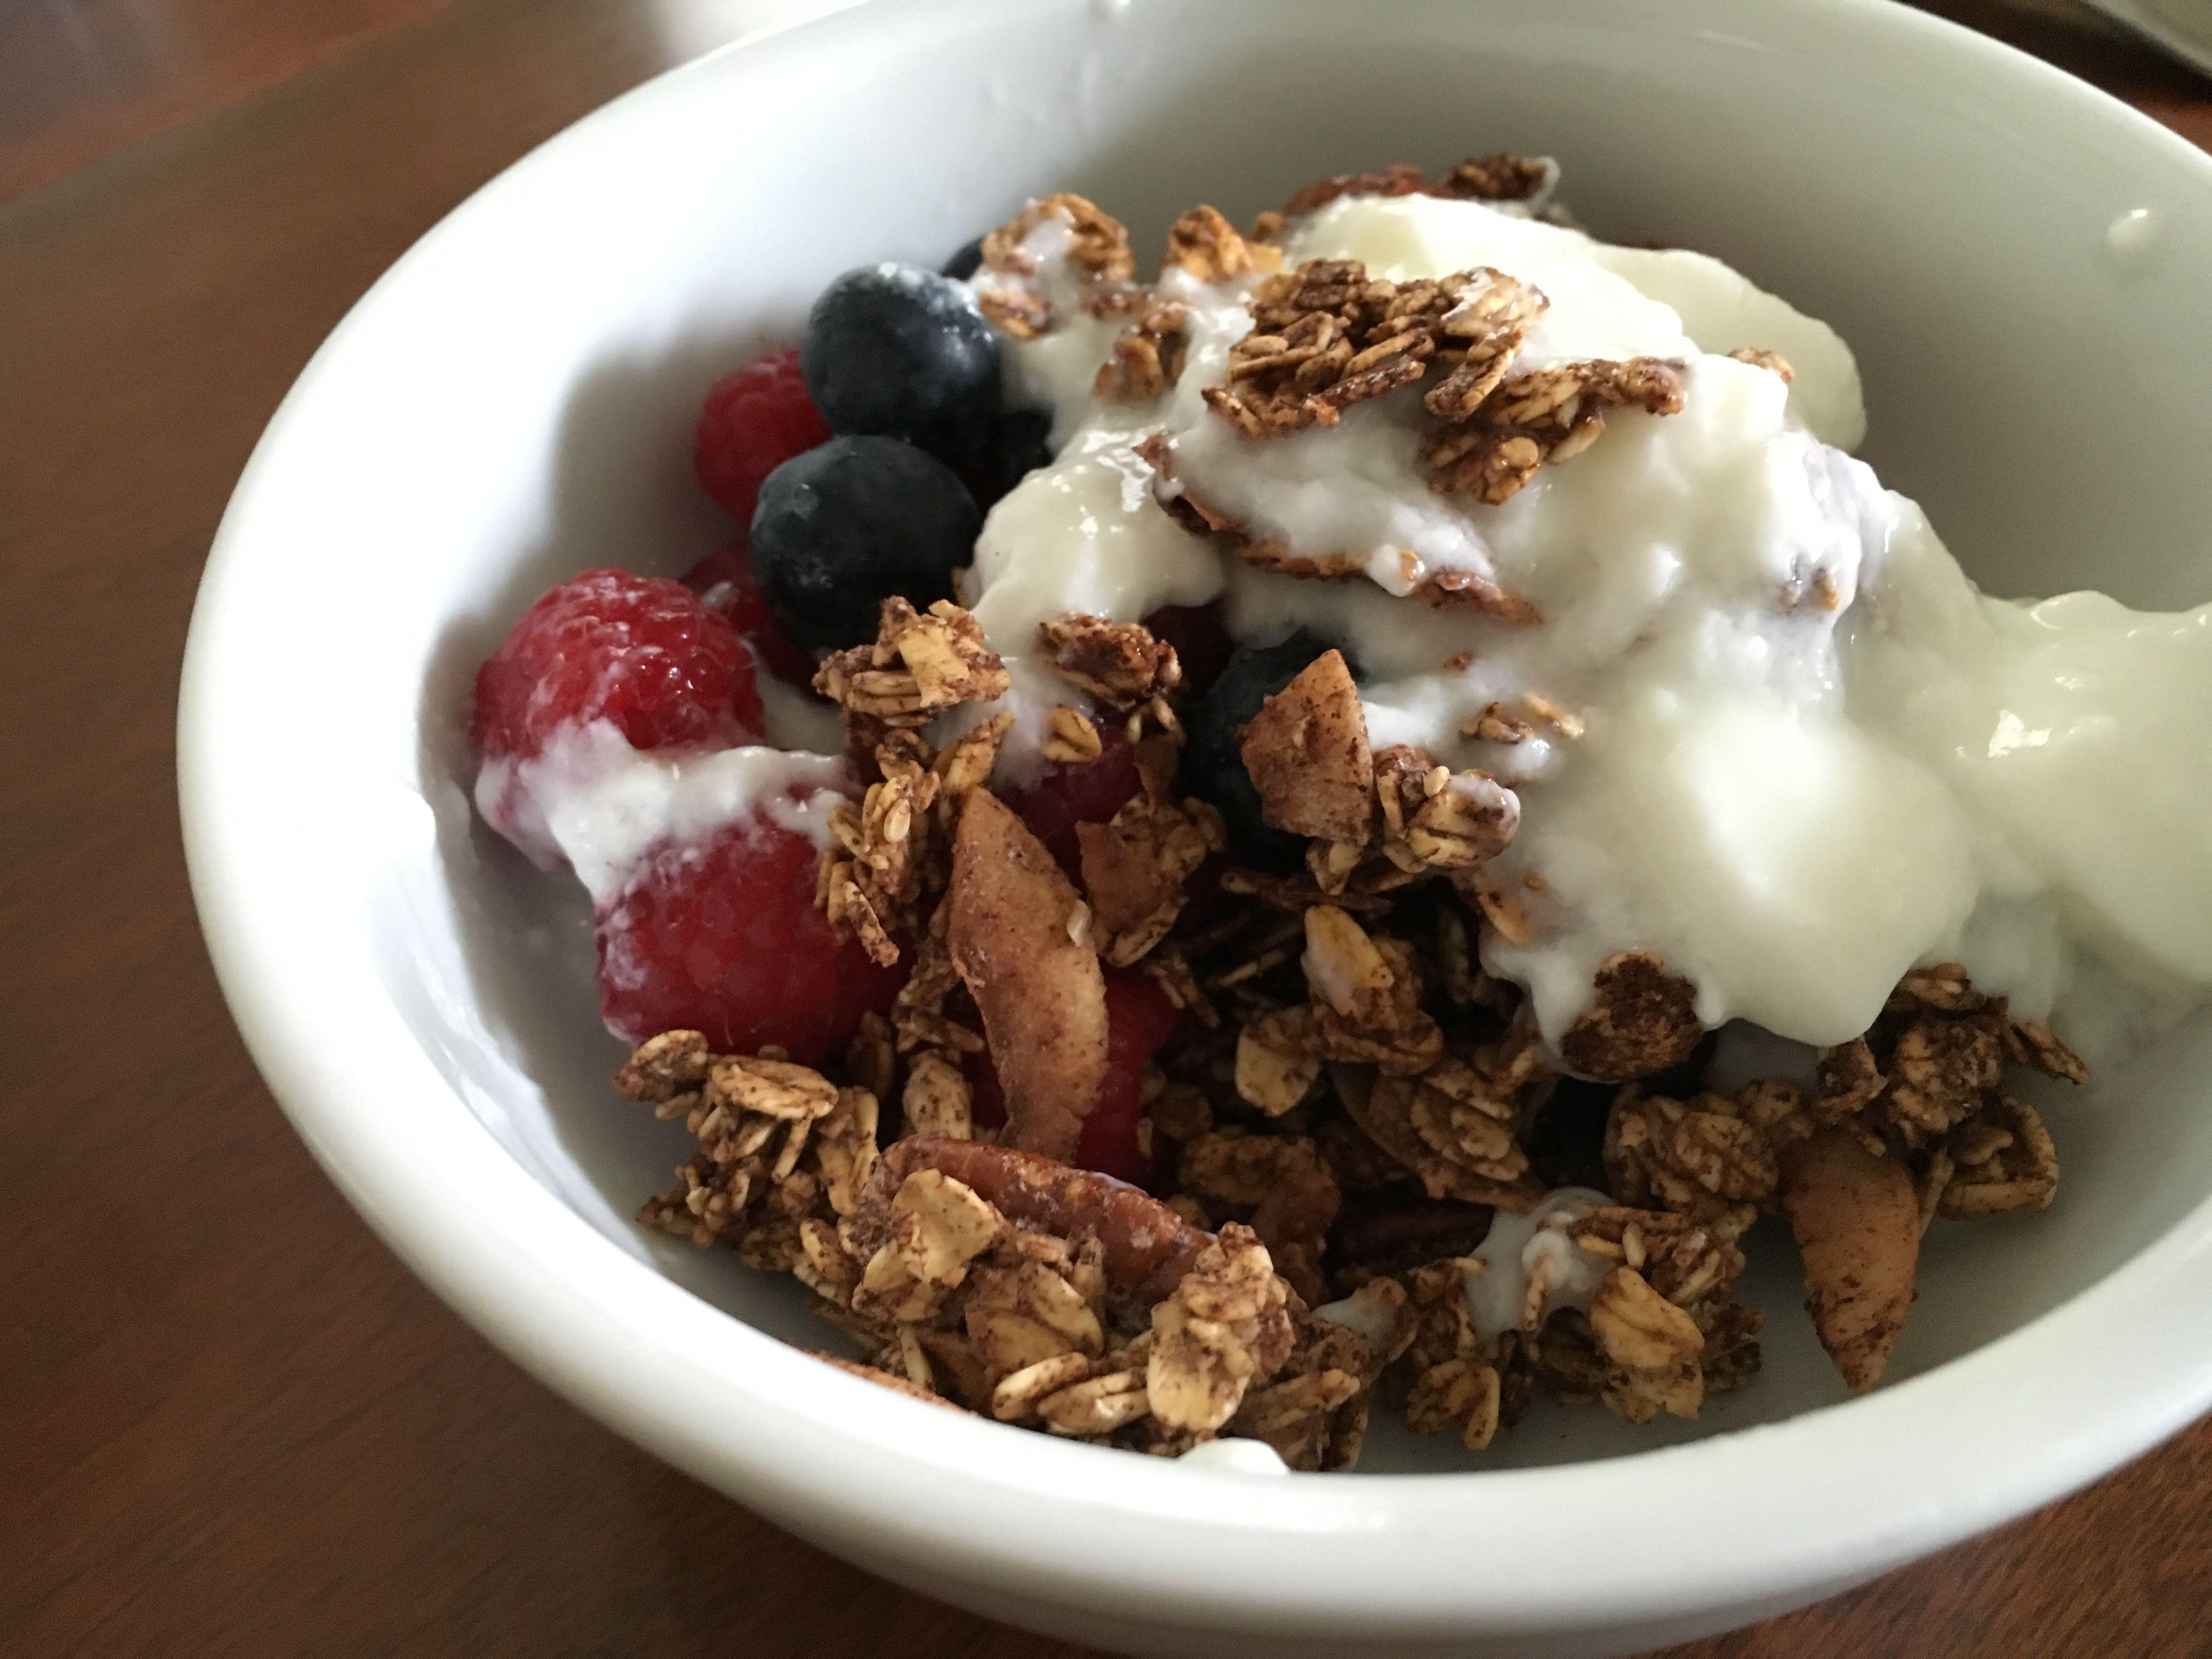 Crunchy Sugar-Free Granola AllrecipesPhoto